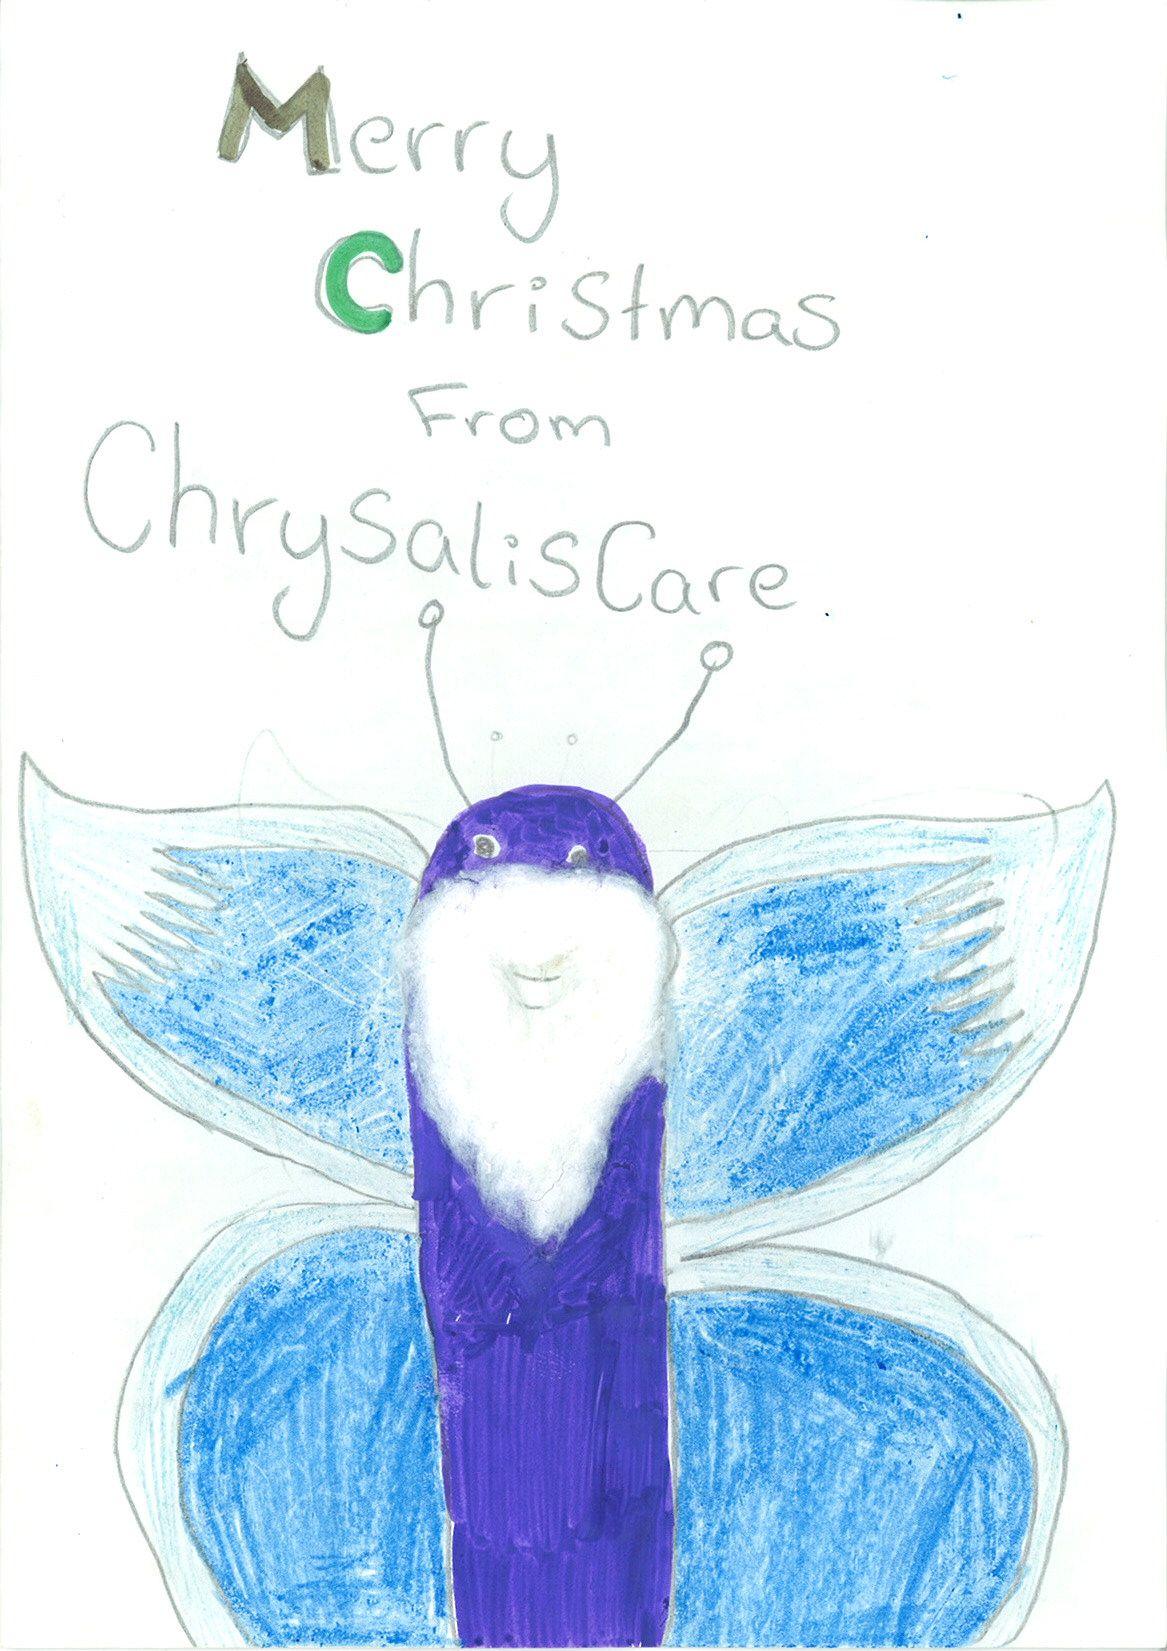 Chrysalis Care Christmas Card Entry #11